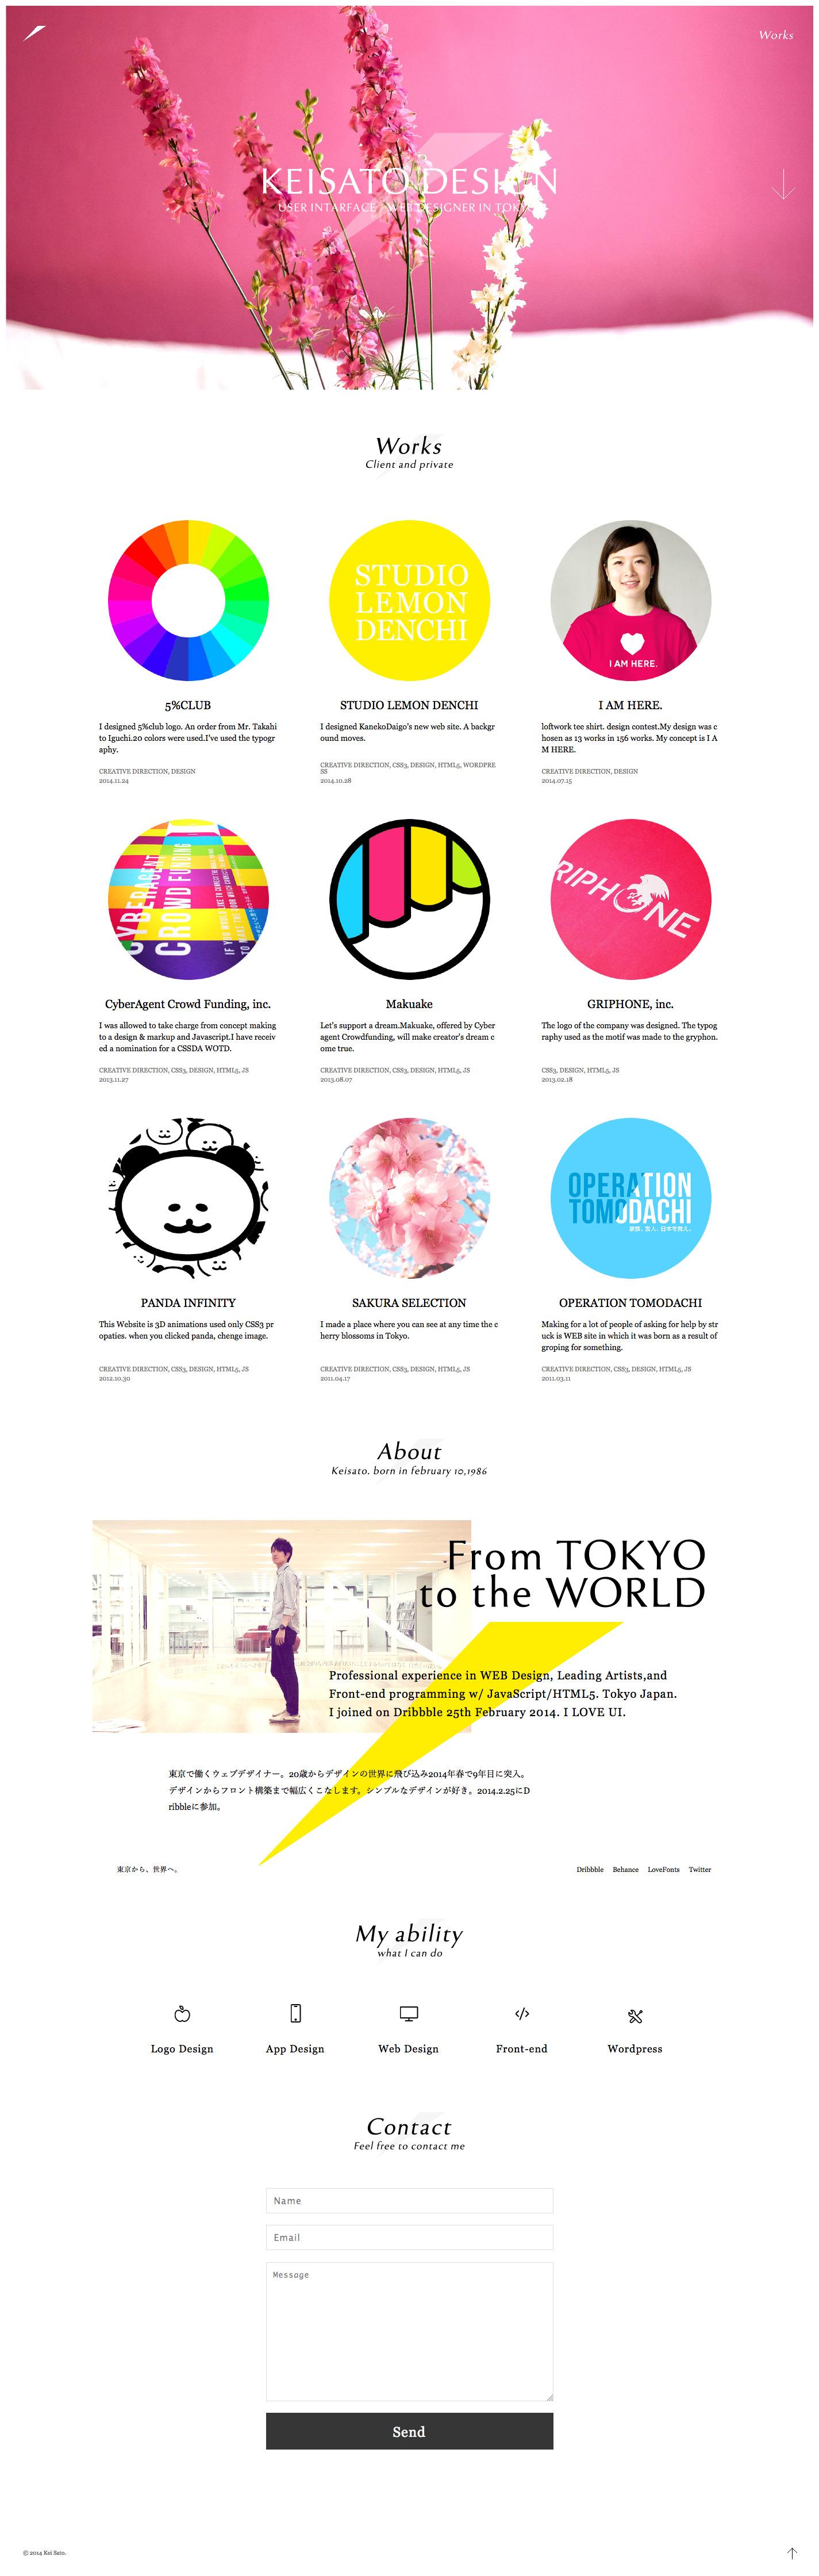 http://keisatodesign.com/